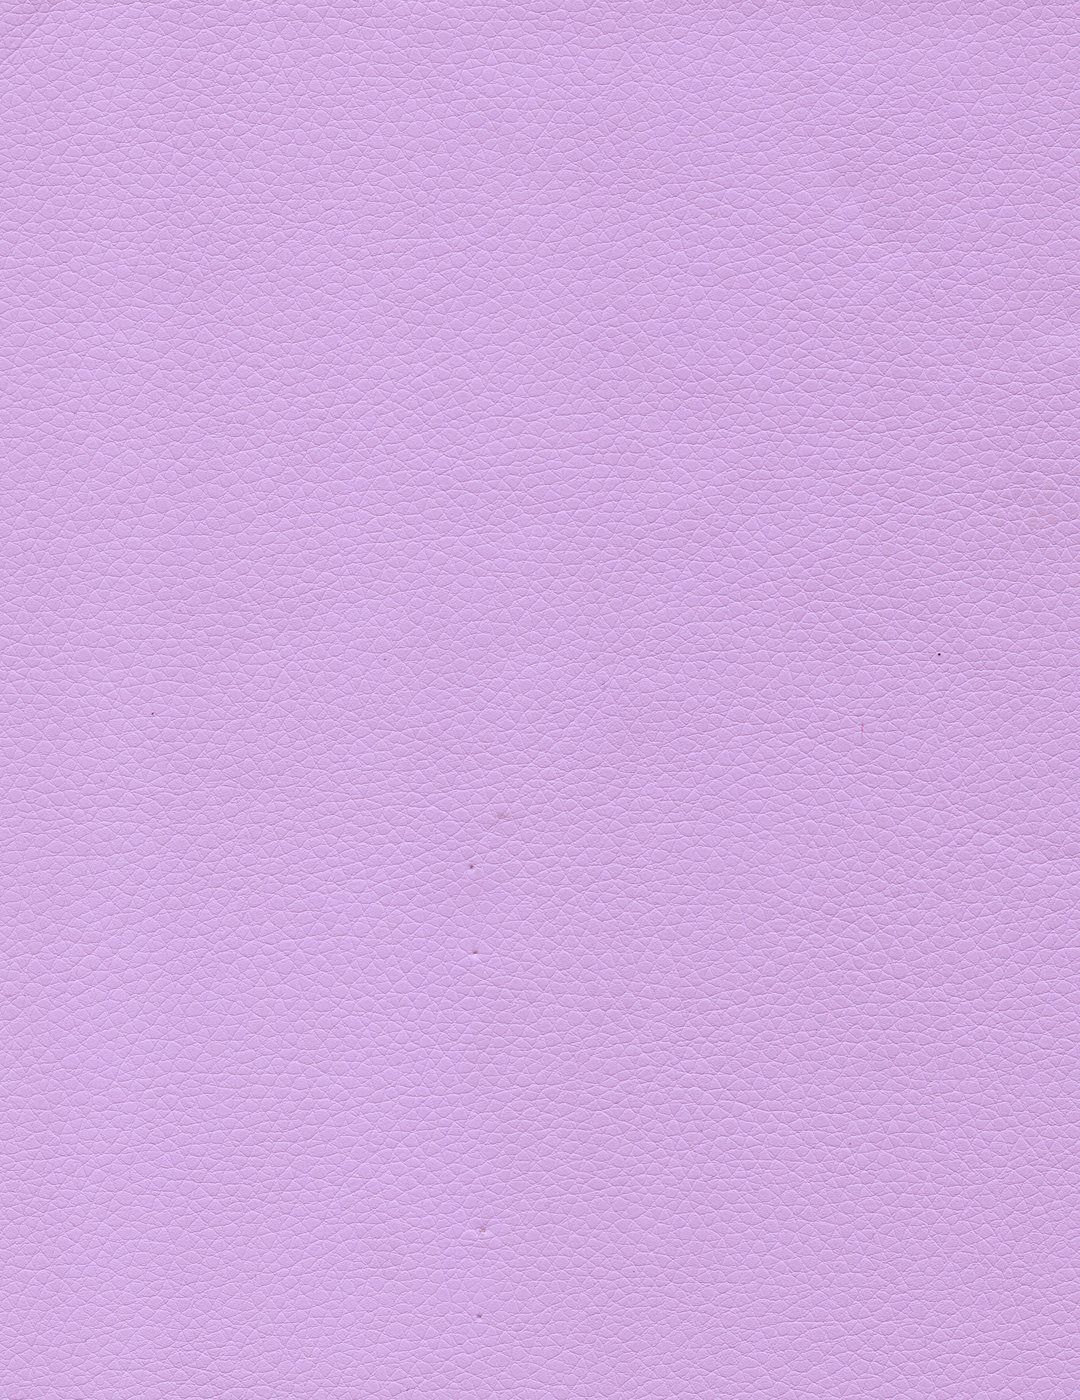 Soft Lavender Marine Vinyl